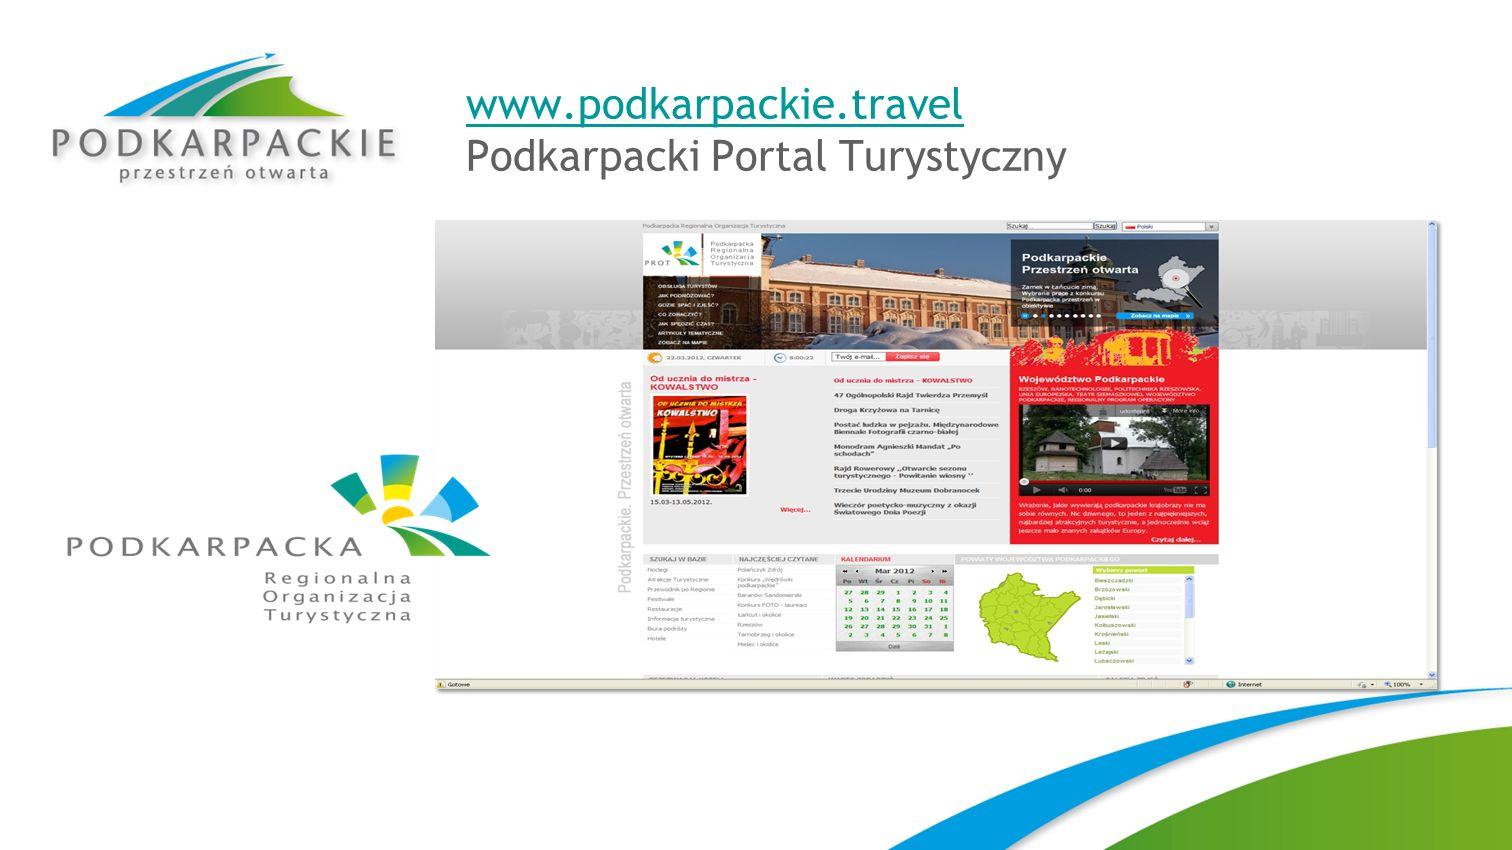 www.podkarpackie.travel www.podkarpackie.travel Podkarpacki Portal Turystyczny